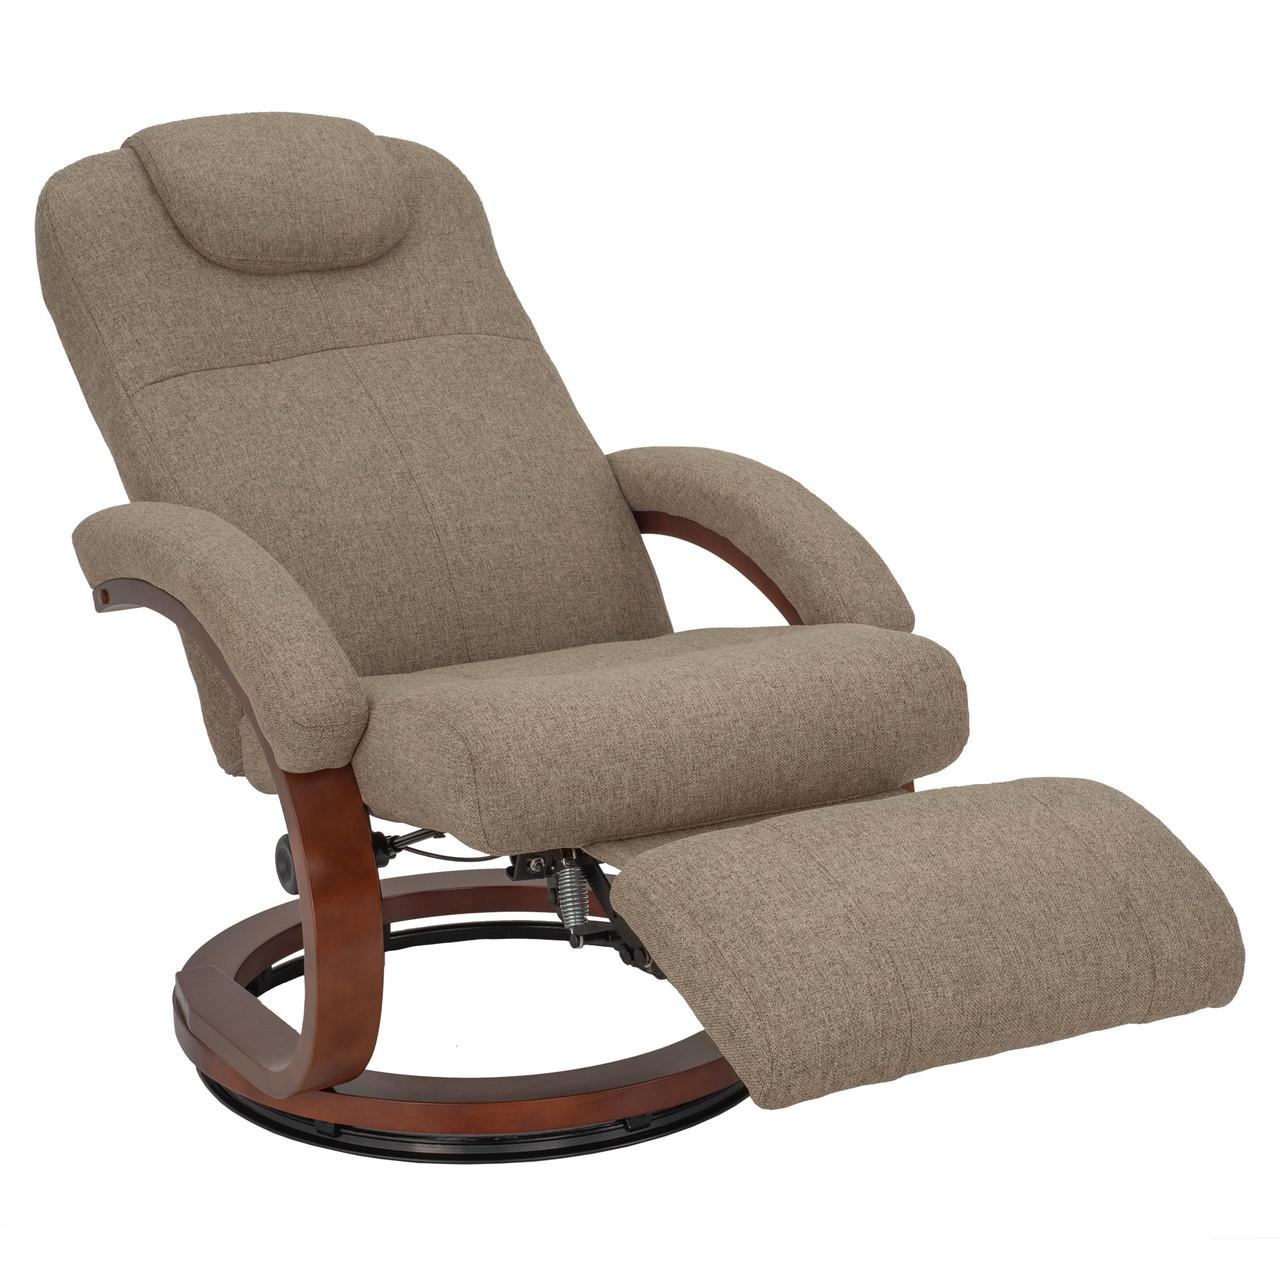 Pleasing Recpro Charles 28 Rv Euro Chair Recliner In Cloth Recpro Machost Co Dining Chair Design Ideas Machostcouk